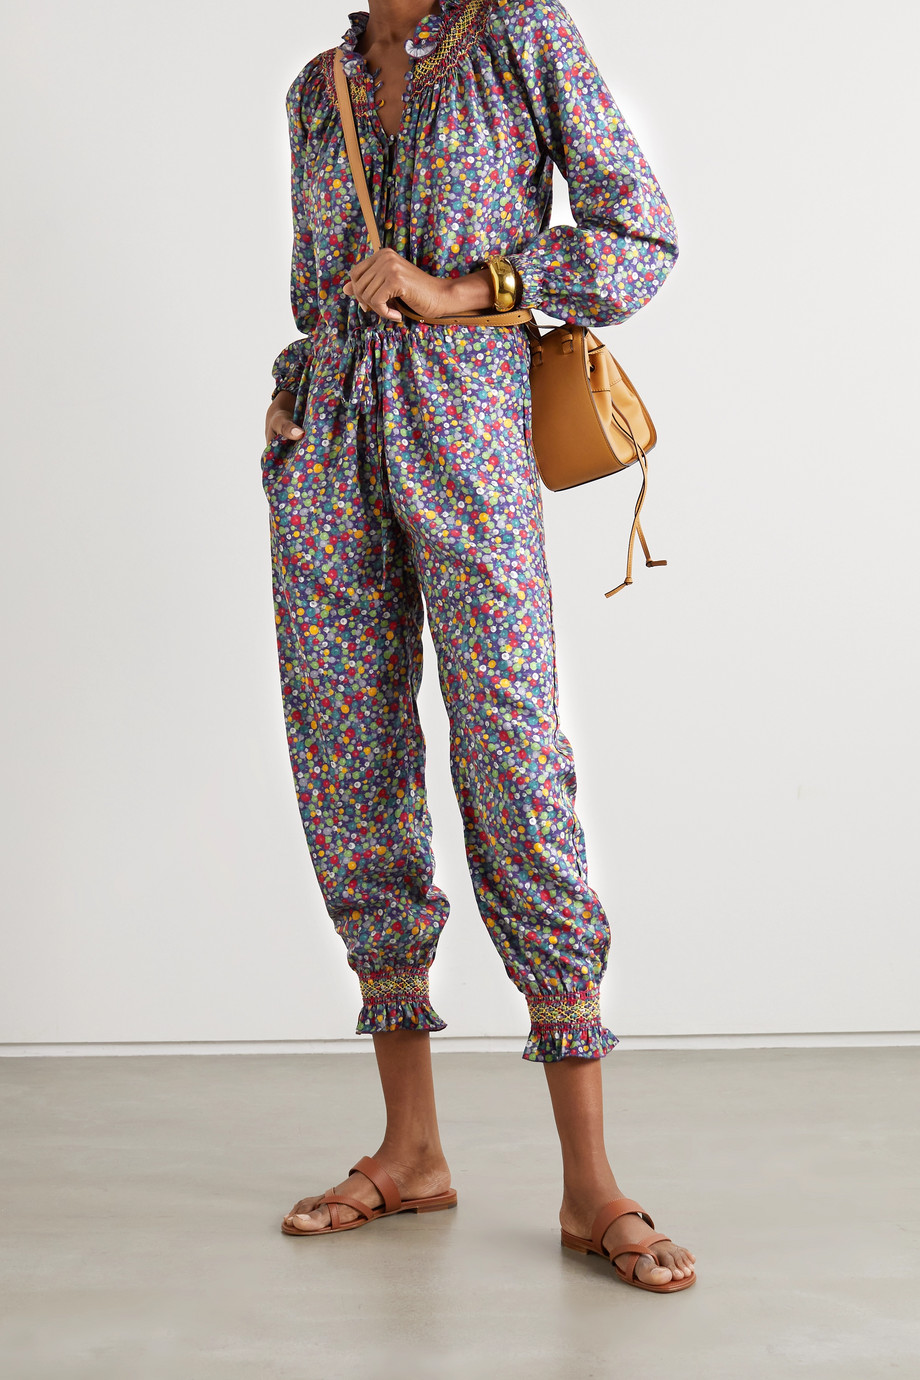 Loretta Caponi Christina ruffled smocked printed poplin jumpsuit